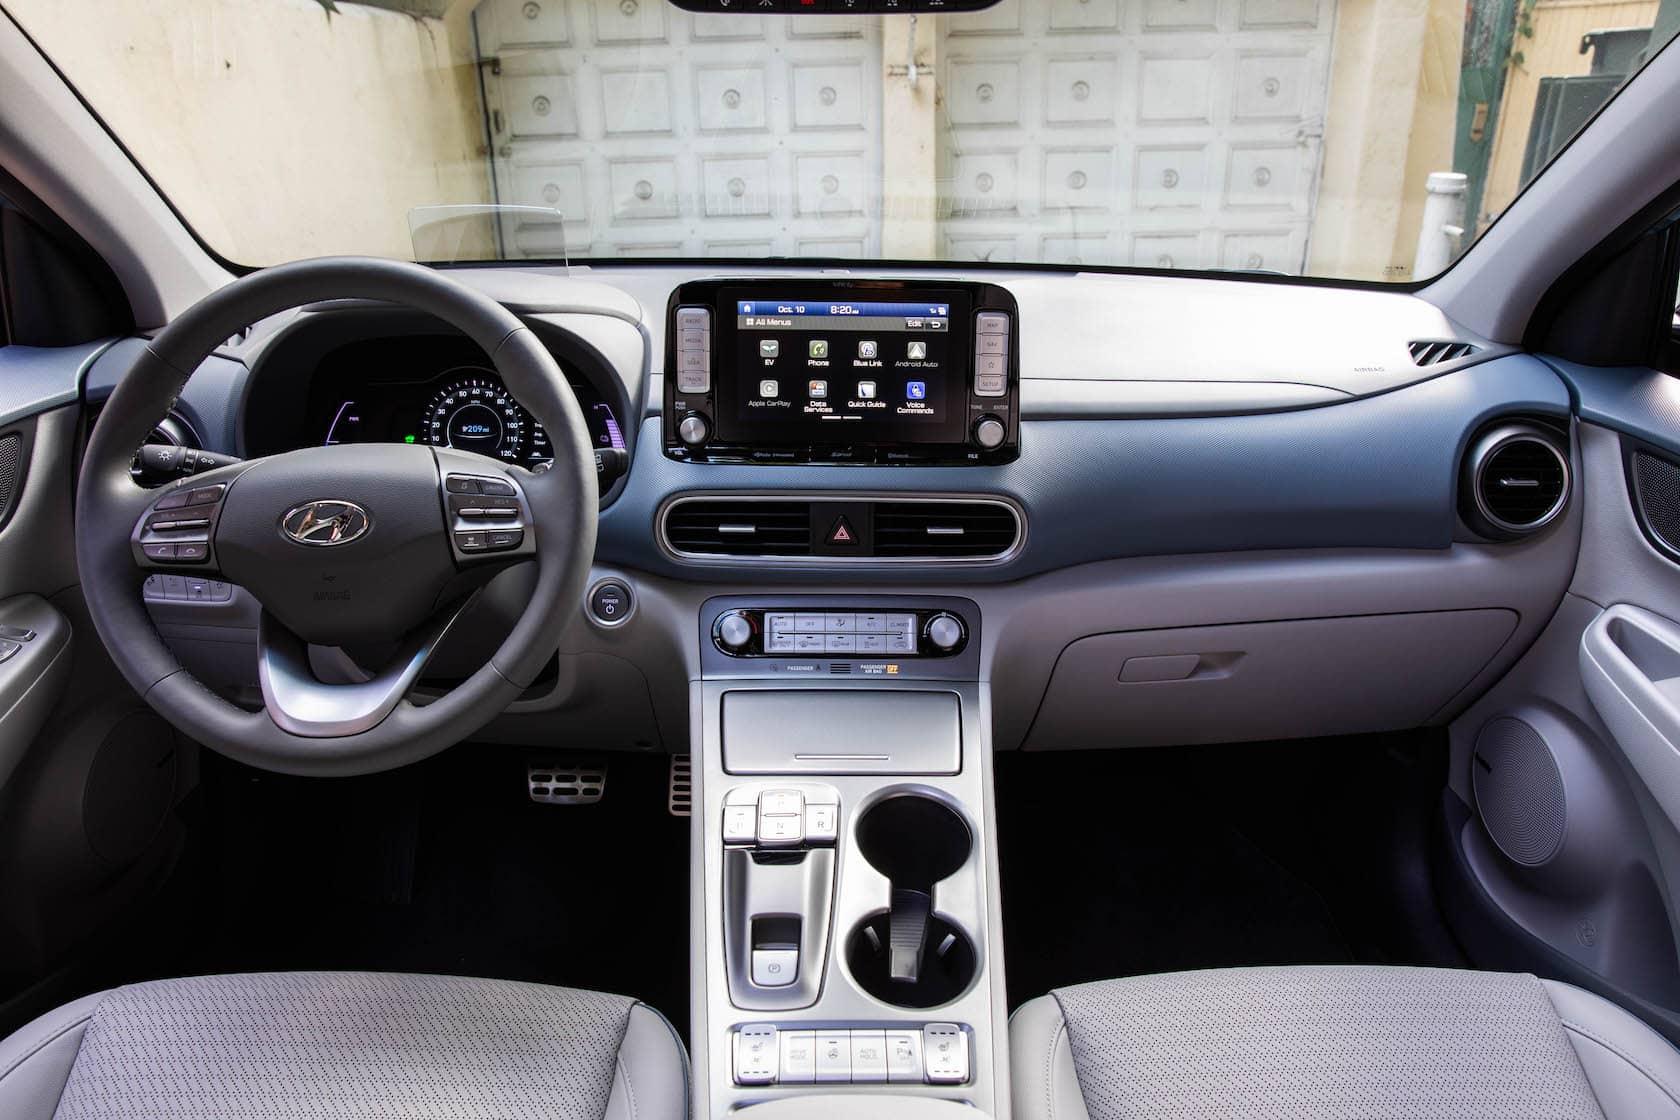 2019 Hyundai Kona Electric Pricing Confirmed For Full Ev